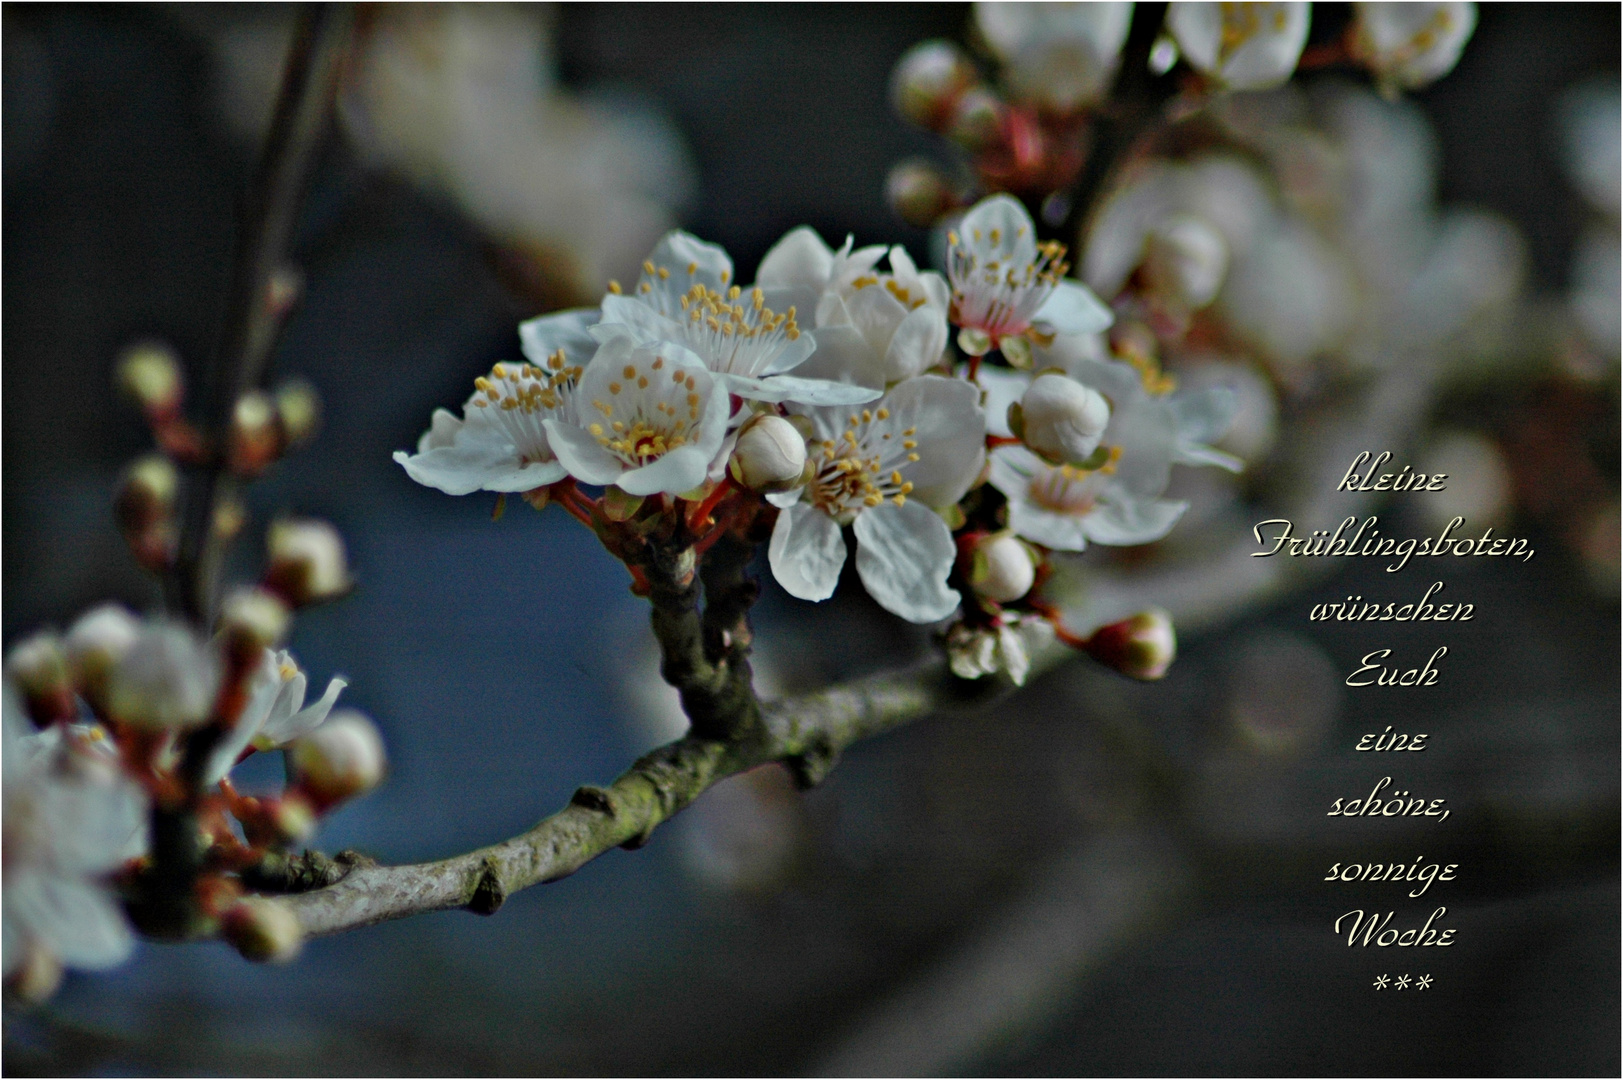 *kleine Frühlingsboten*